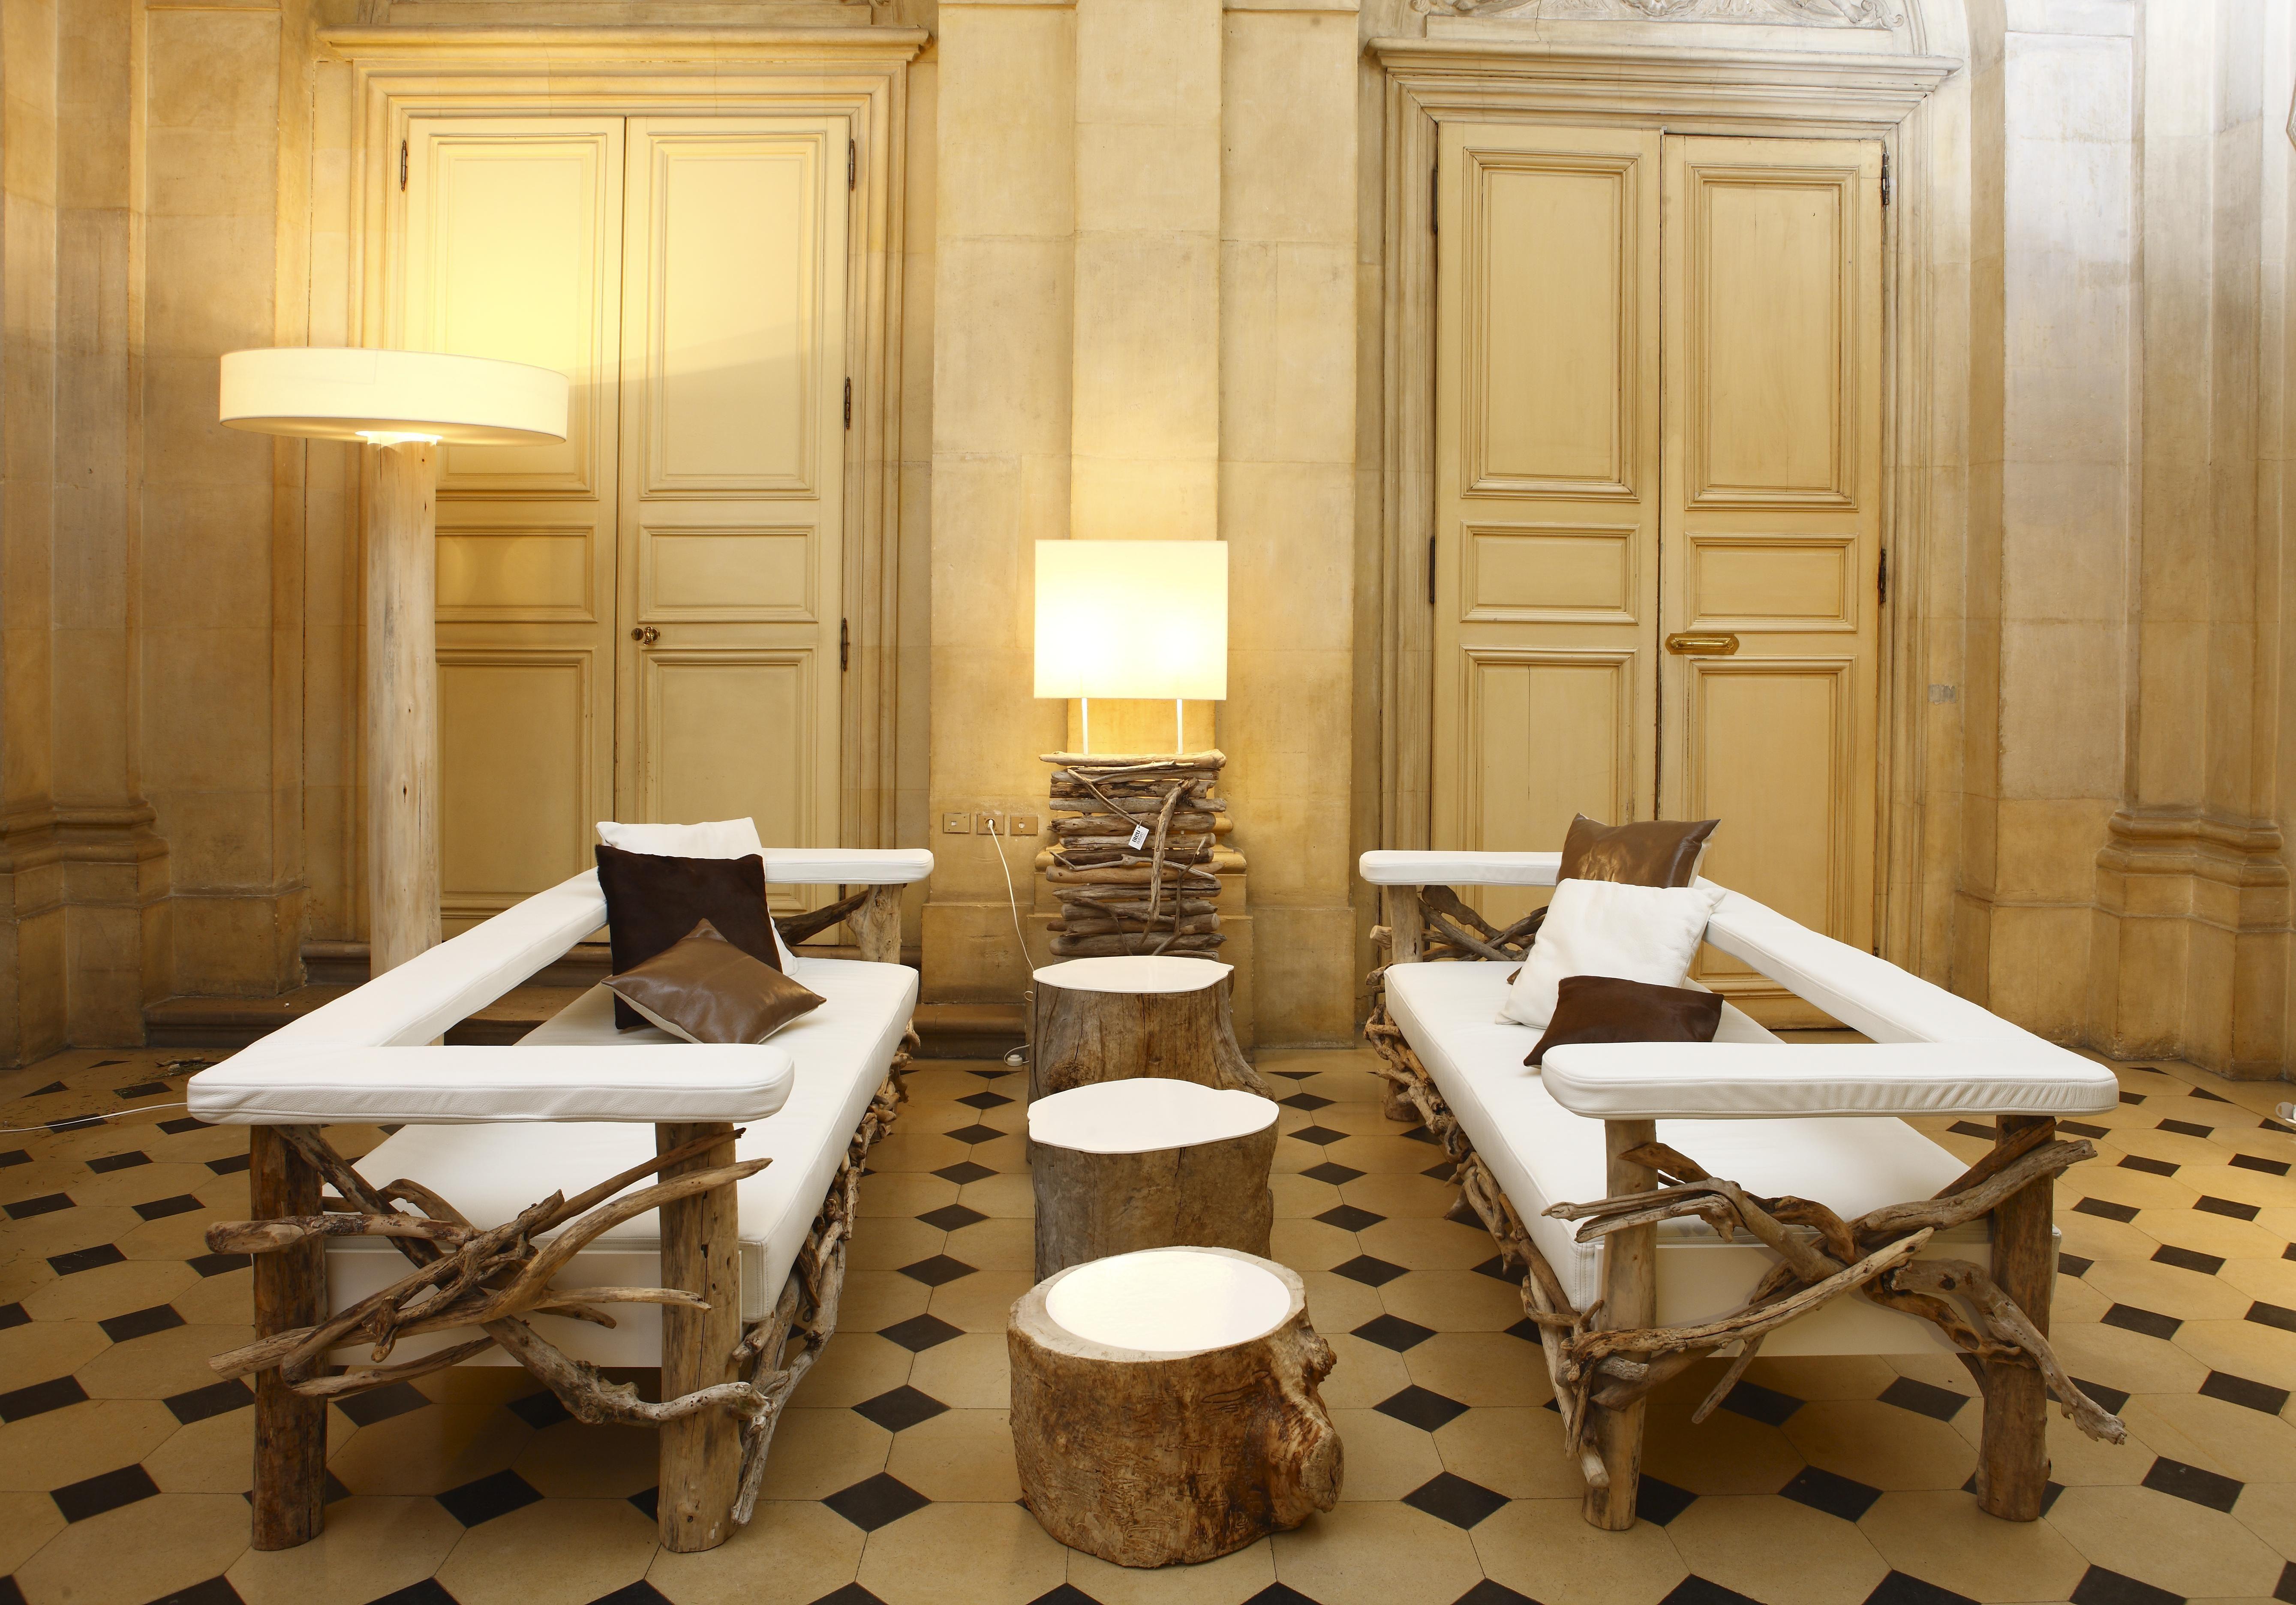 bleu nature minist re de l 39 cologie paris france bleu nature project furniture. Black Bedroom Furniture Sets. Home Design Ideas